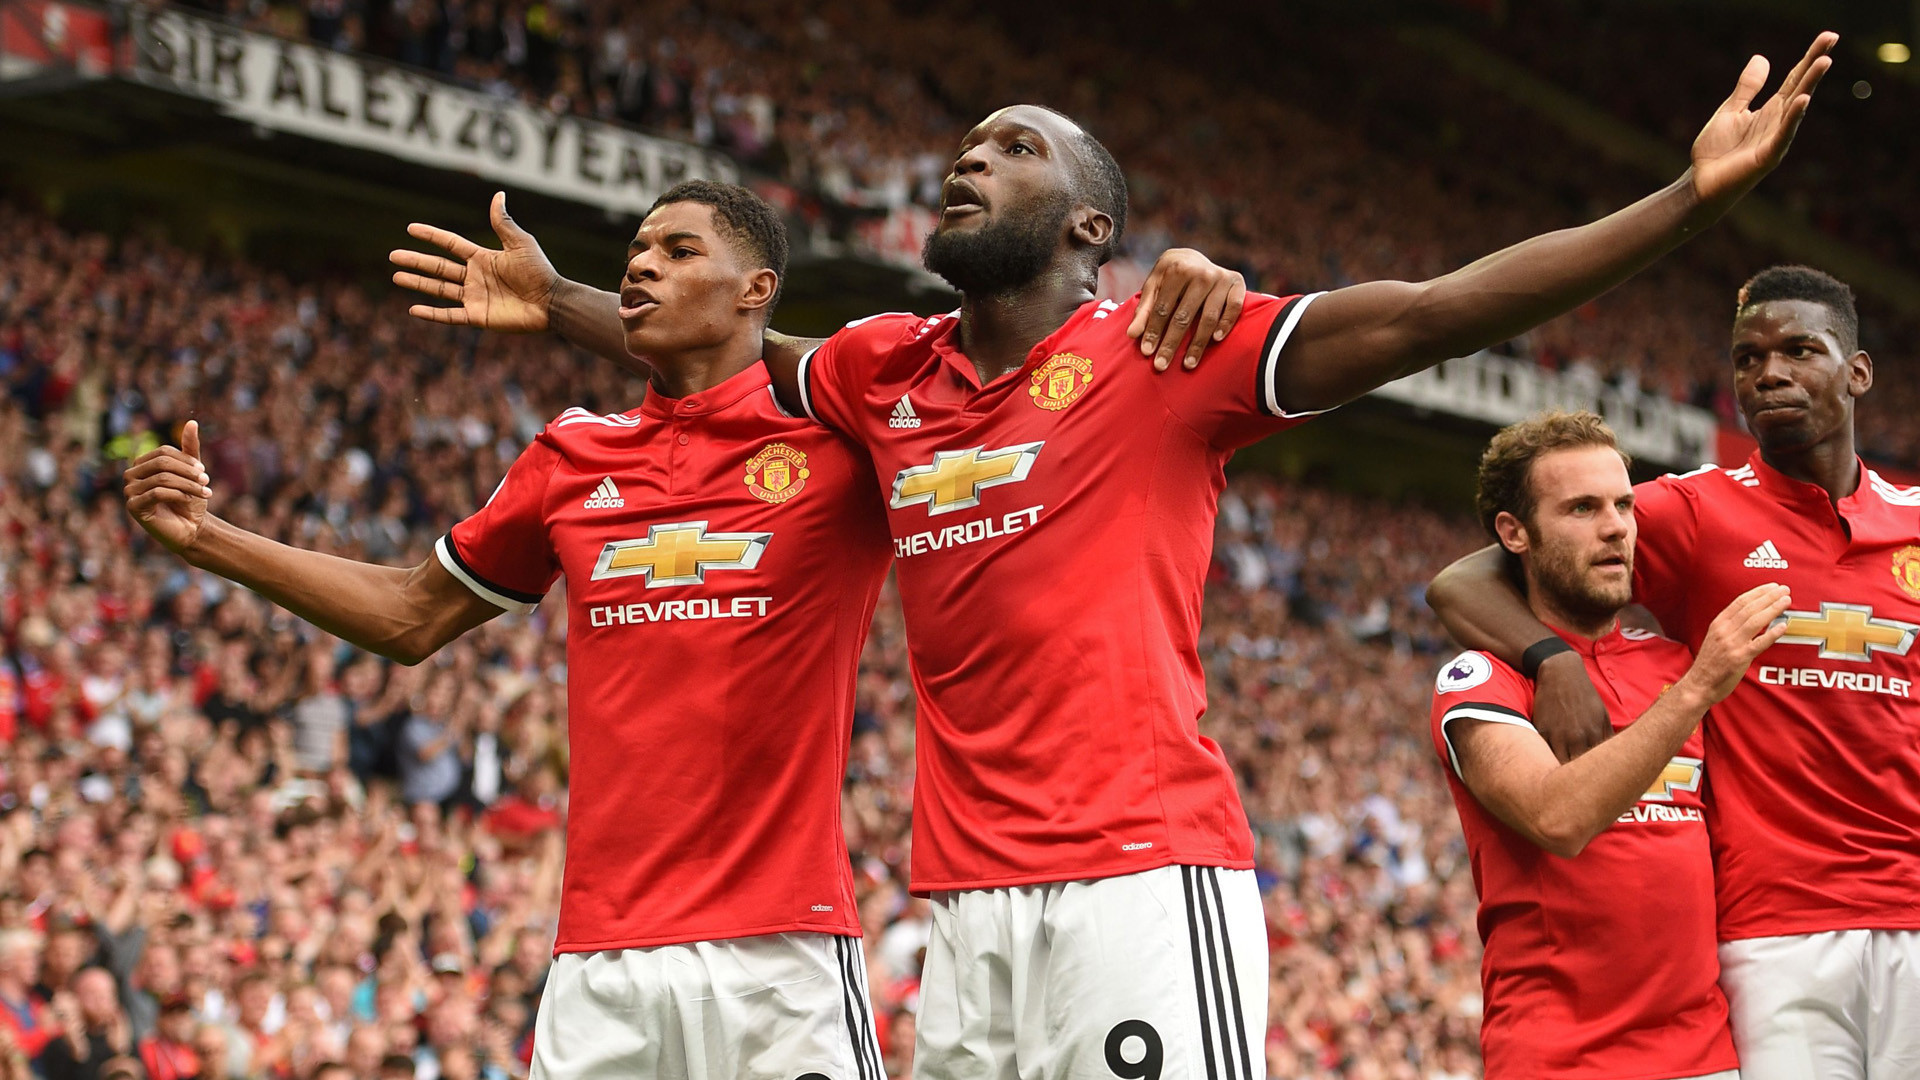 Manchester United Wallpaper 2018 ·① WallpaperTag